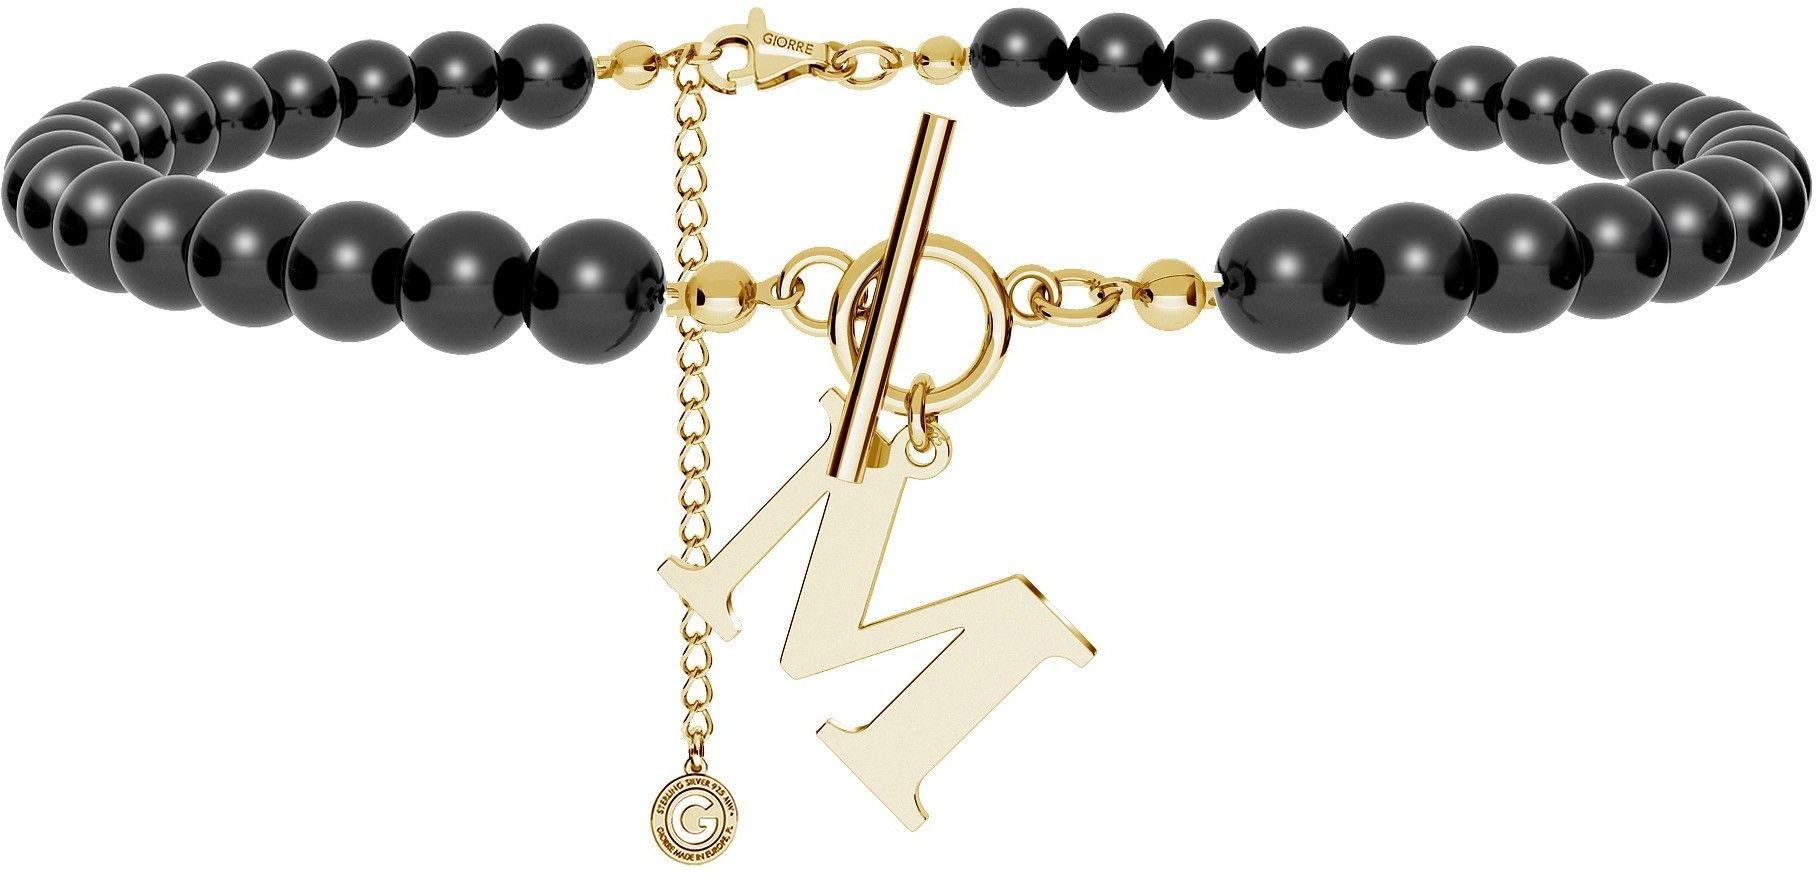 Czarny perłowy choker z dowolną literą, Swarovski, srebro 925 : Litera - V, Srebro - kolor pokrycia - Pokrycie platyną